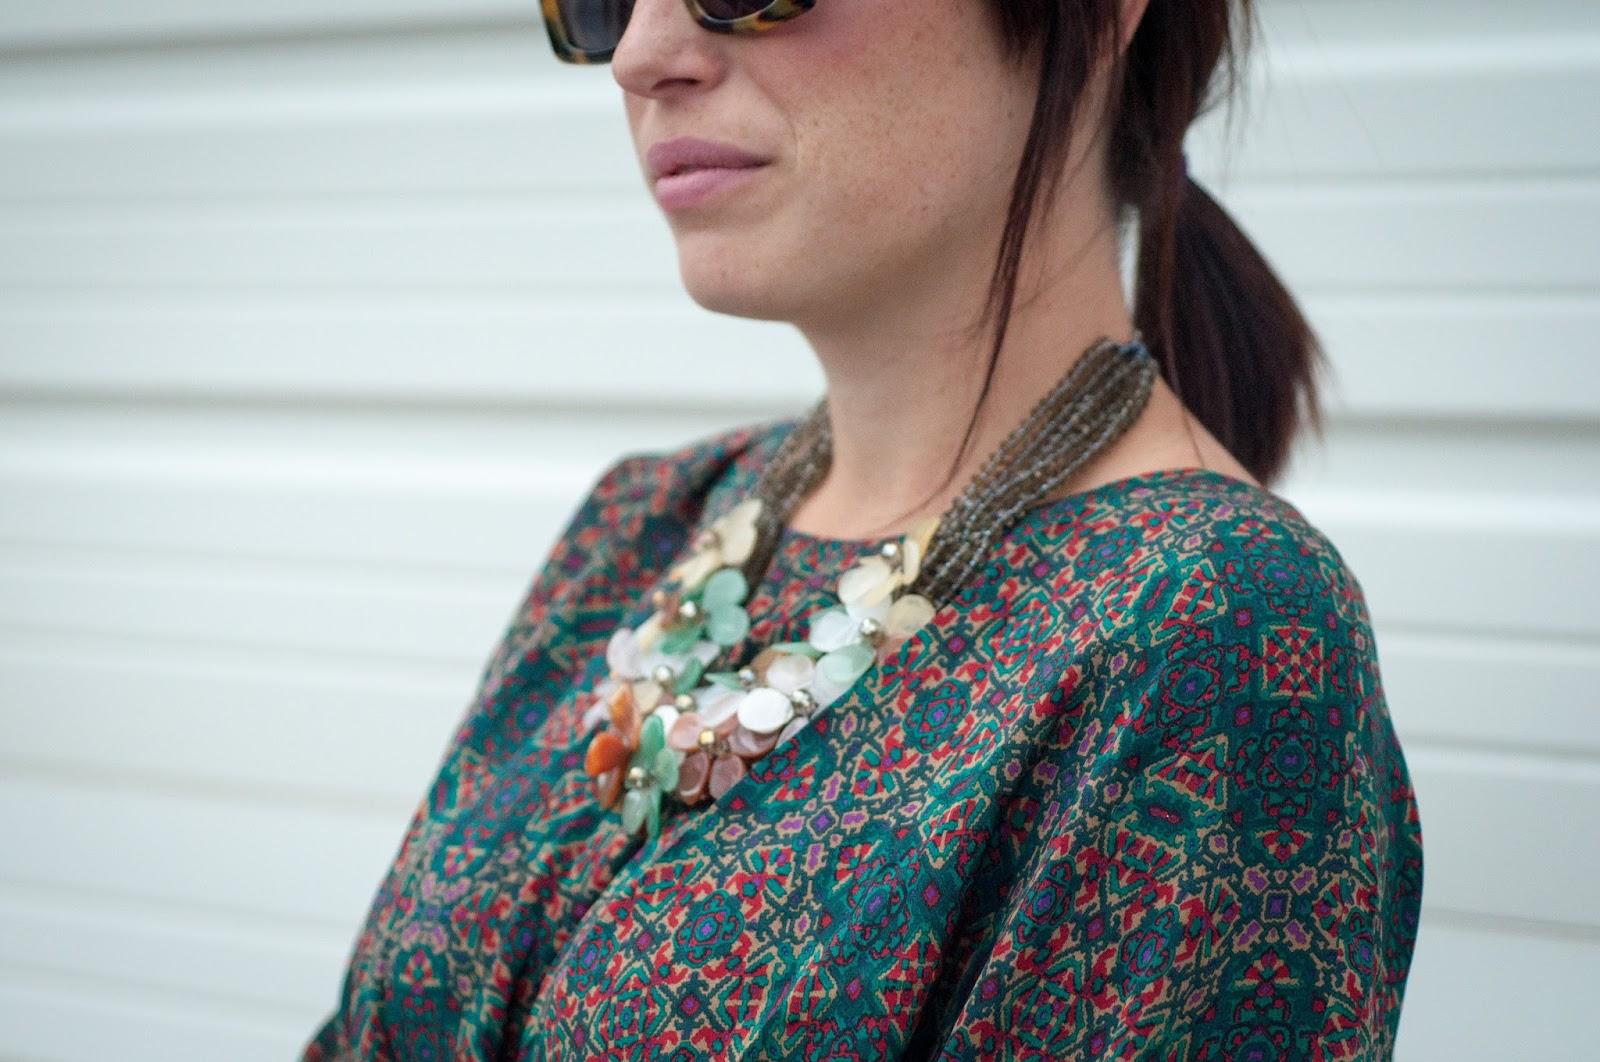 ootd, anthropologie ootd, floral necklace, karen walker sunglasses, karen walker, what i wore